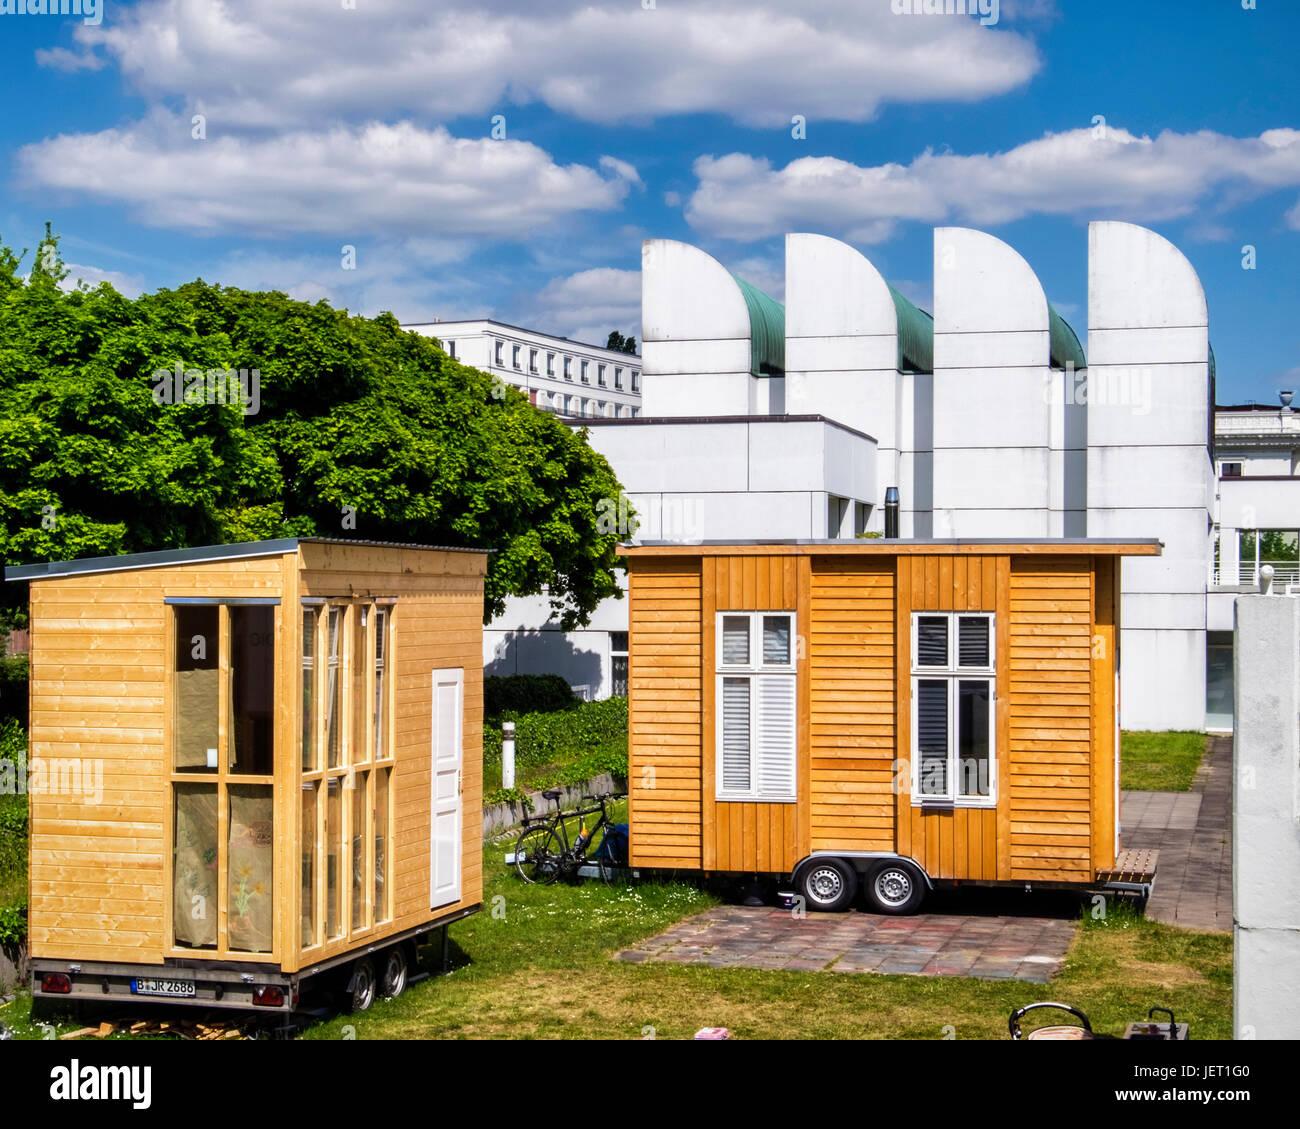 neighborhoods stockfotos neighborhoods bilder alamy. Black Bedroom Furniture Sets. Home Design Ideas